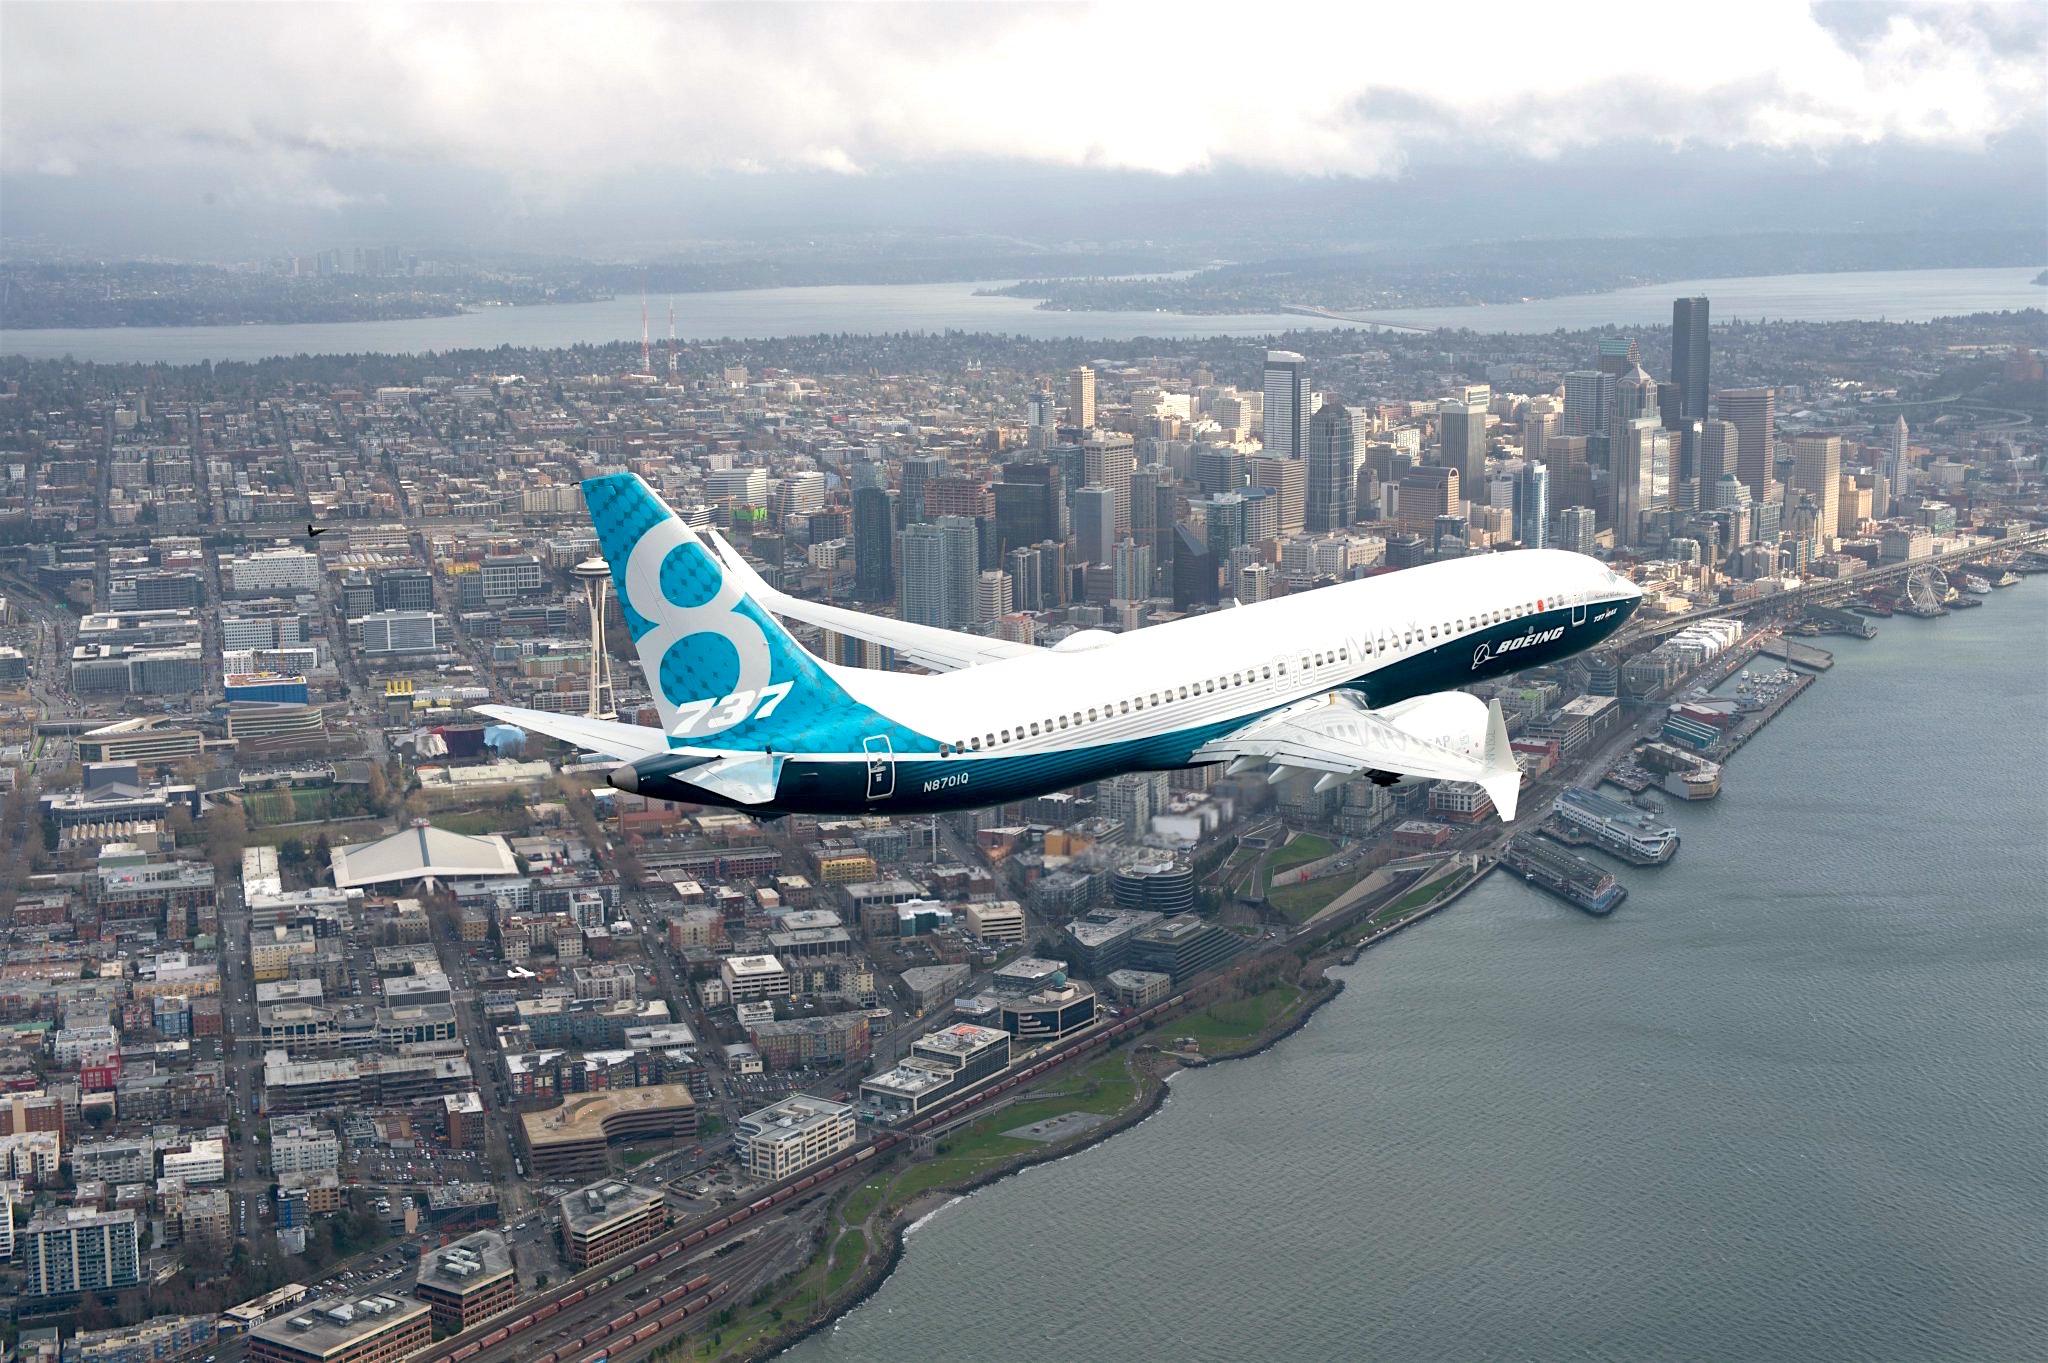 GE Capital commande 100 appareils A320neo pour 10 milliards de dollars — Airbus